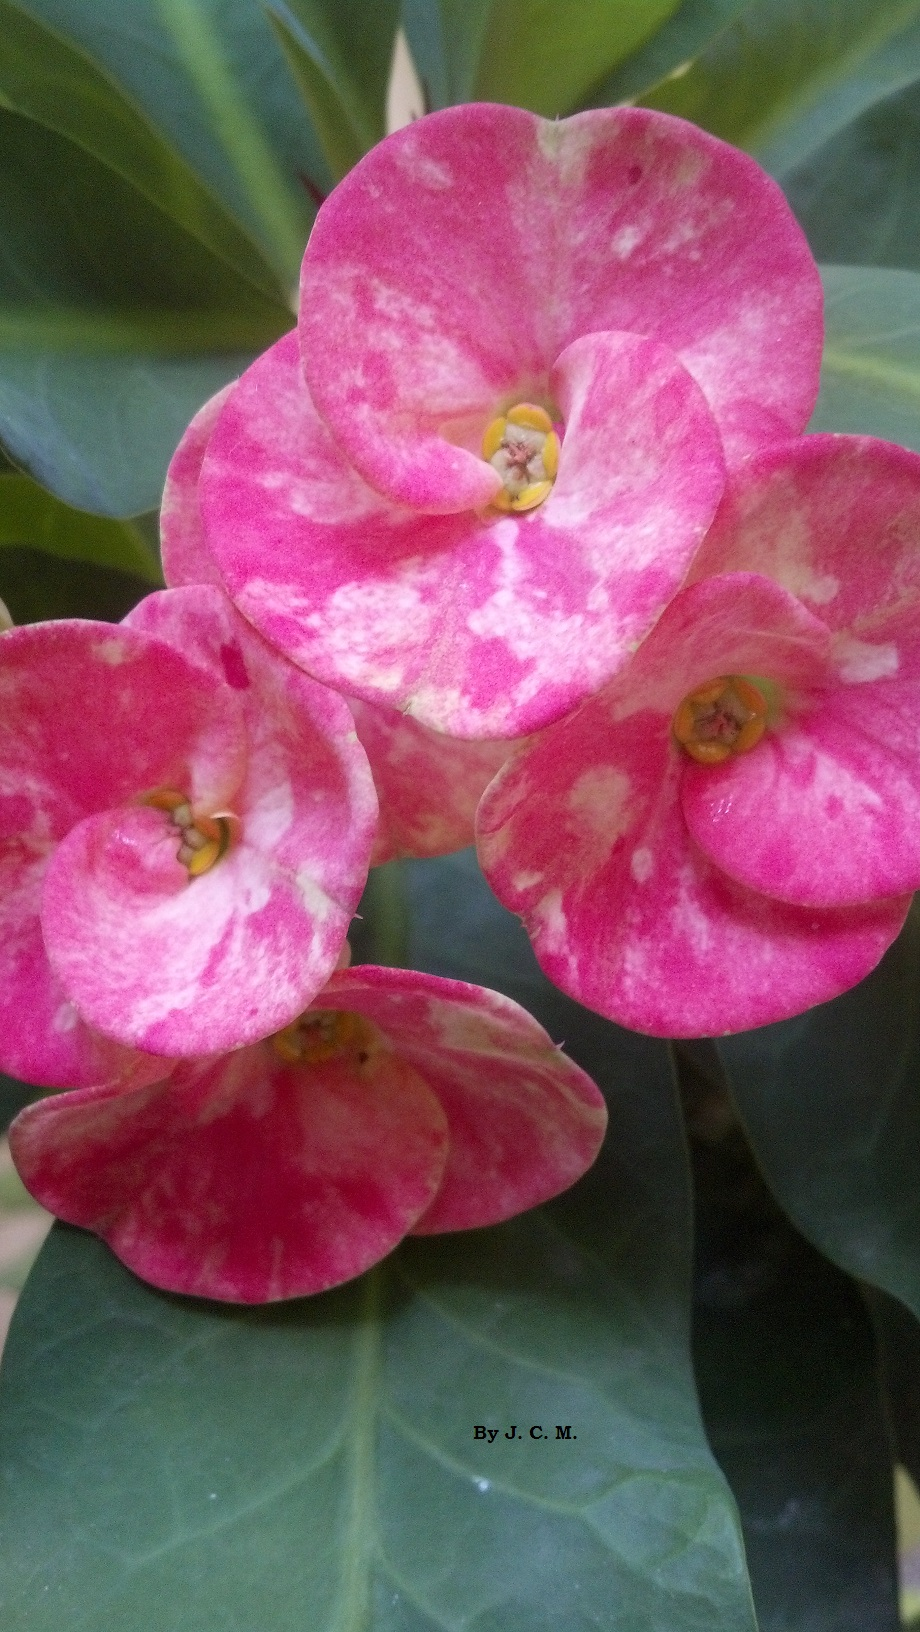 file flor hermosa captada por by j c m jpg wikimedia commons